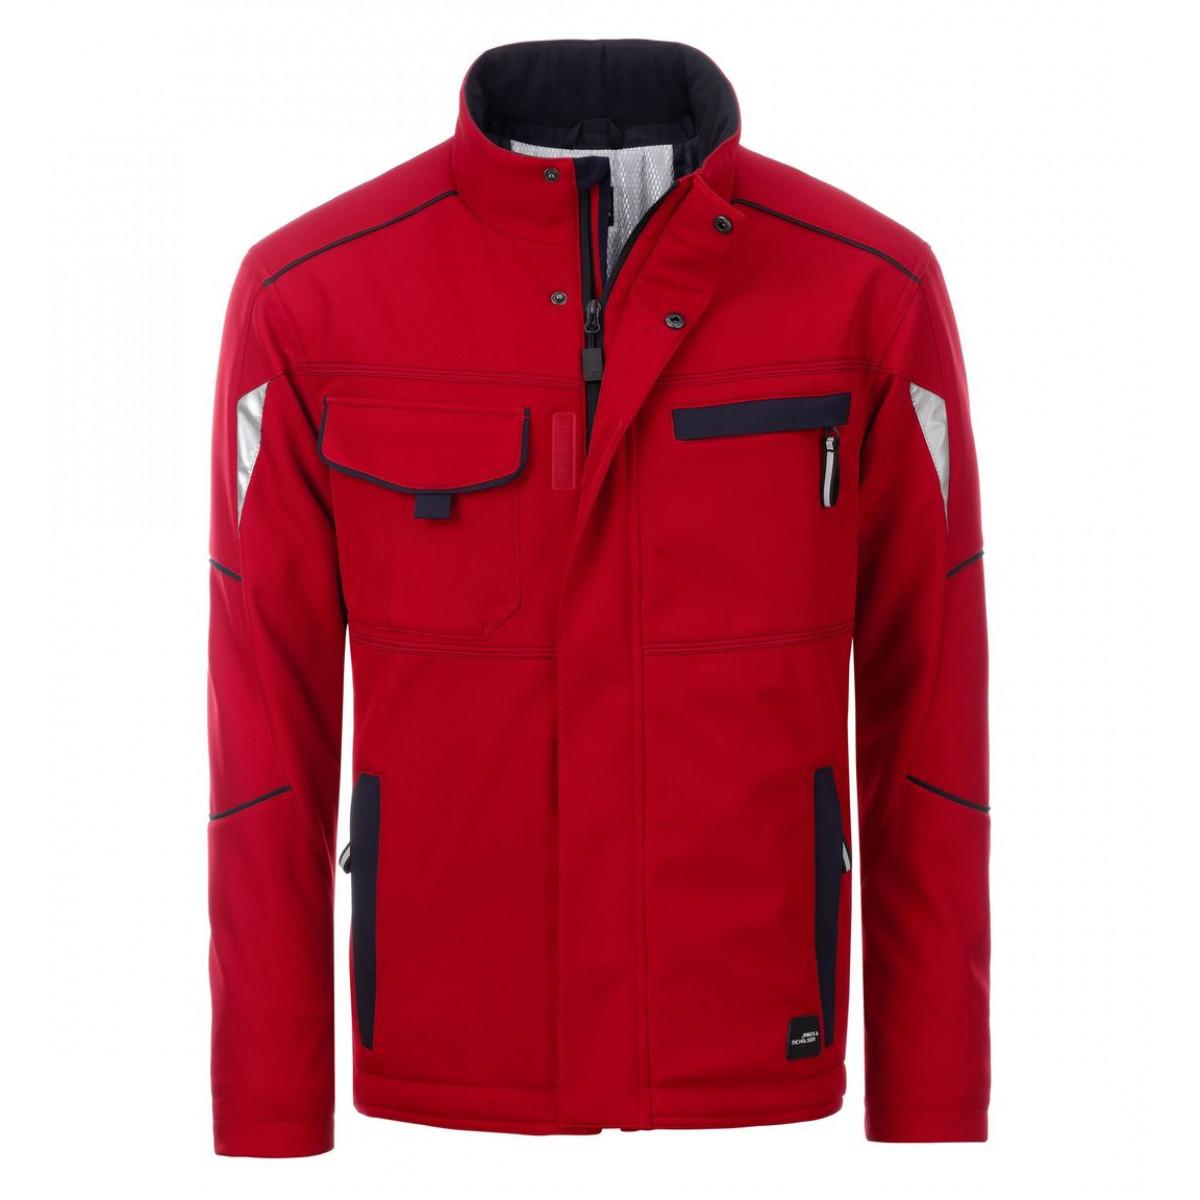 Куртка мужская JN853 Workwear Softshell Padded Jacket-Level 2 - Красный/Темно-синий